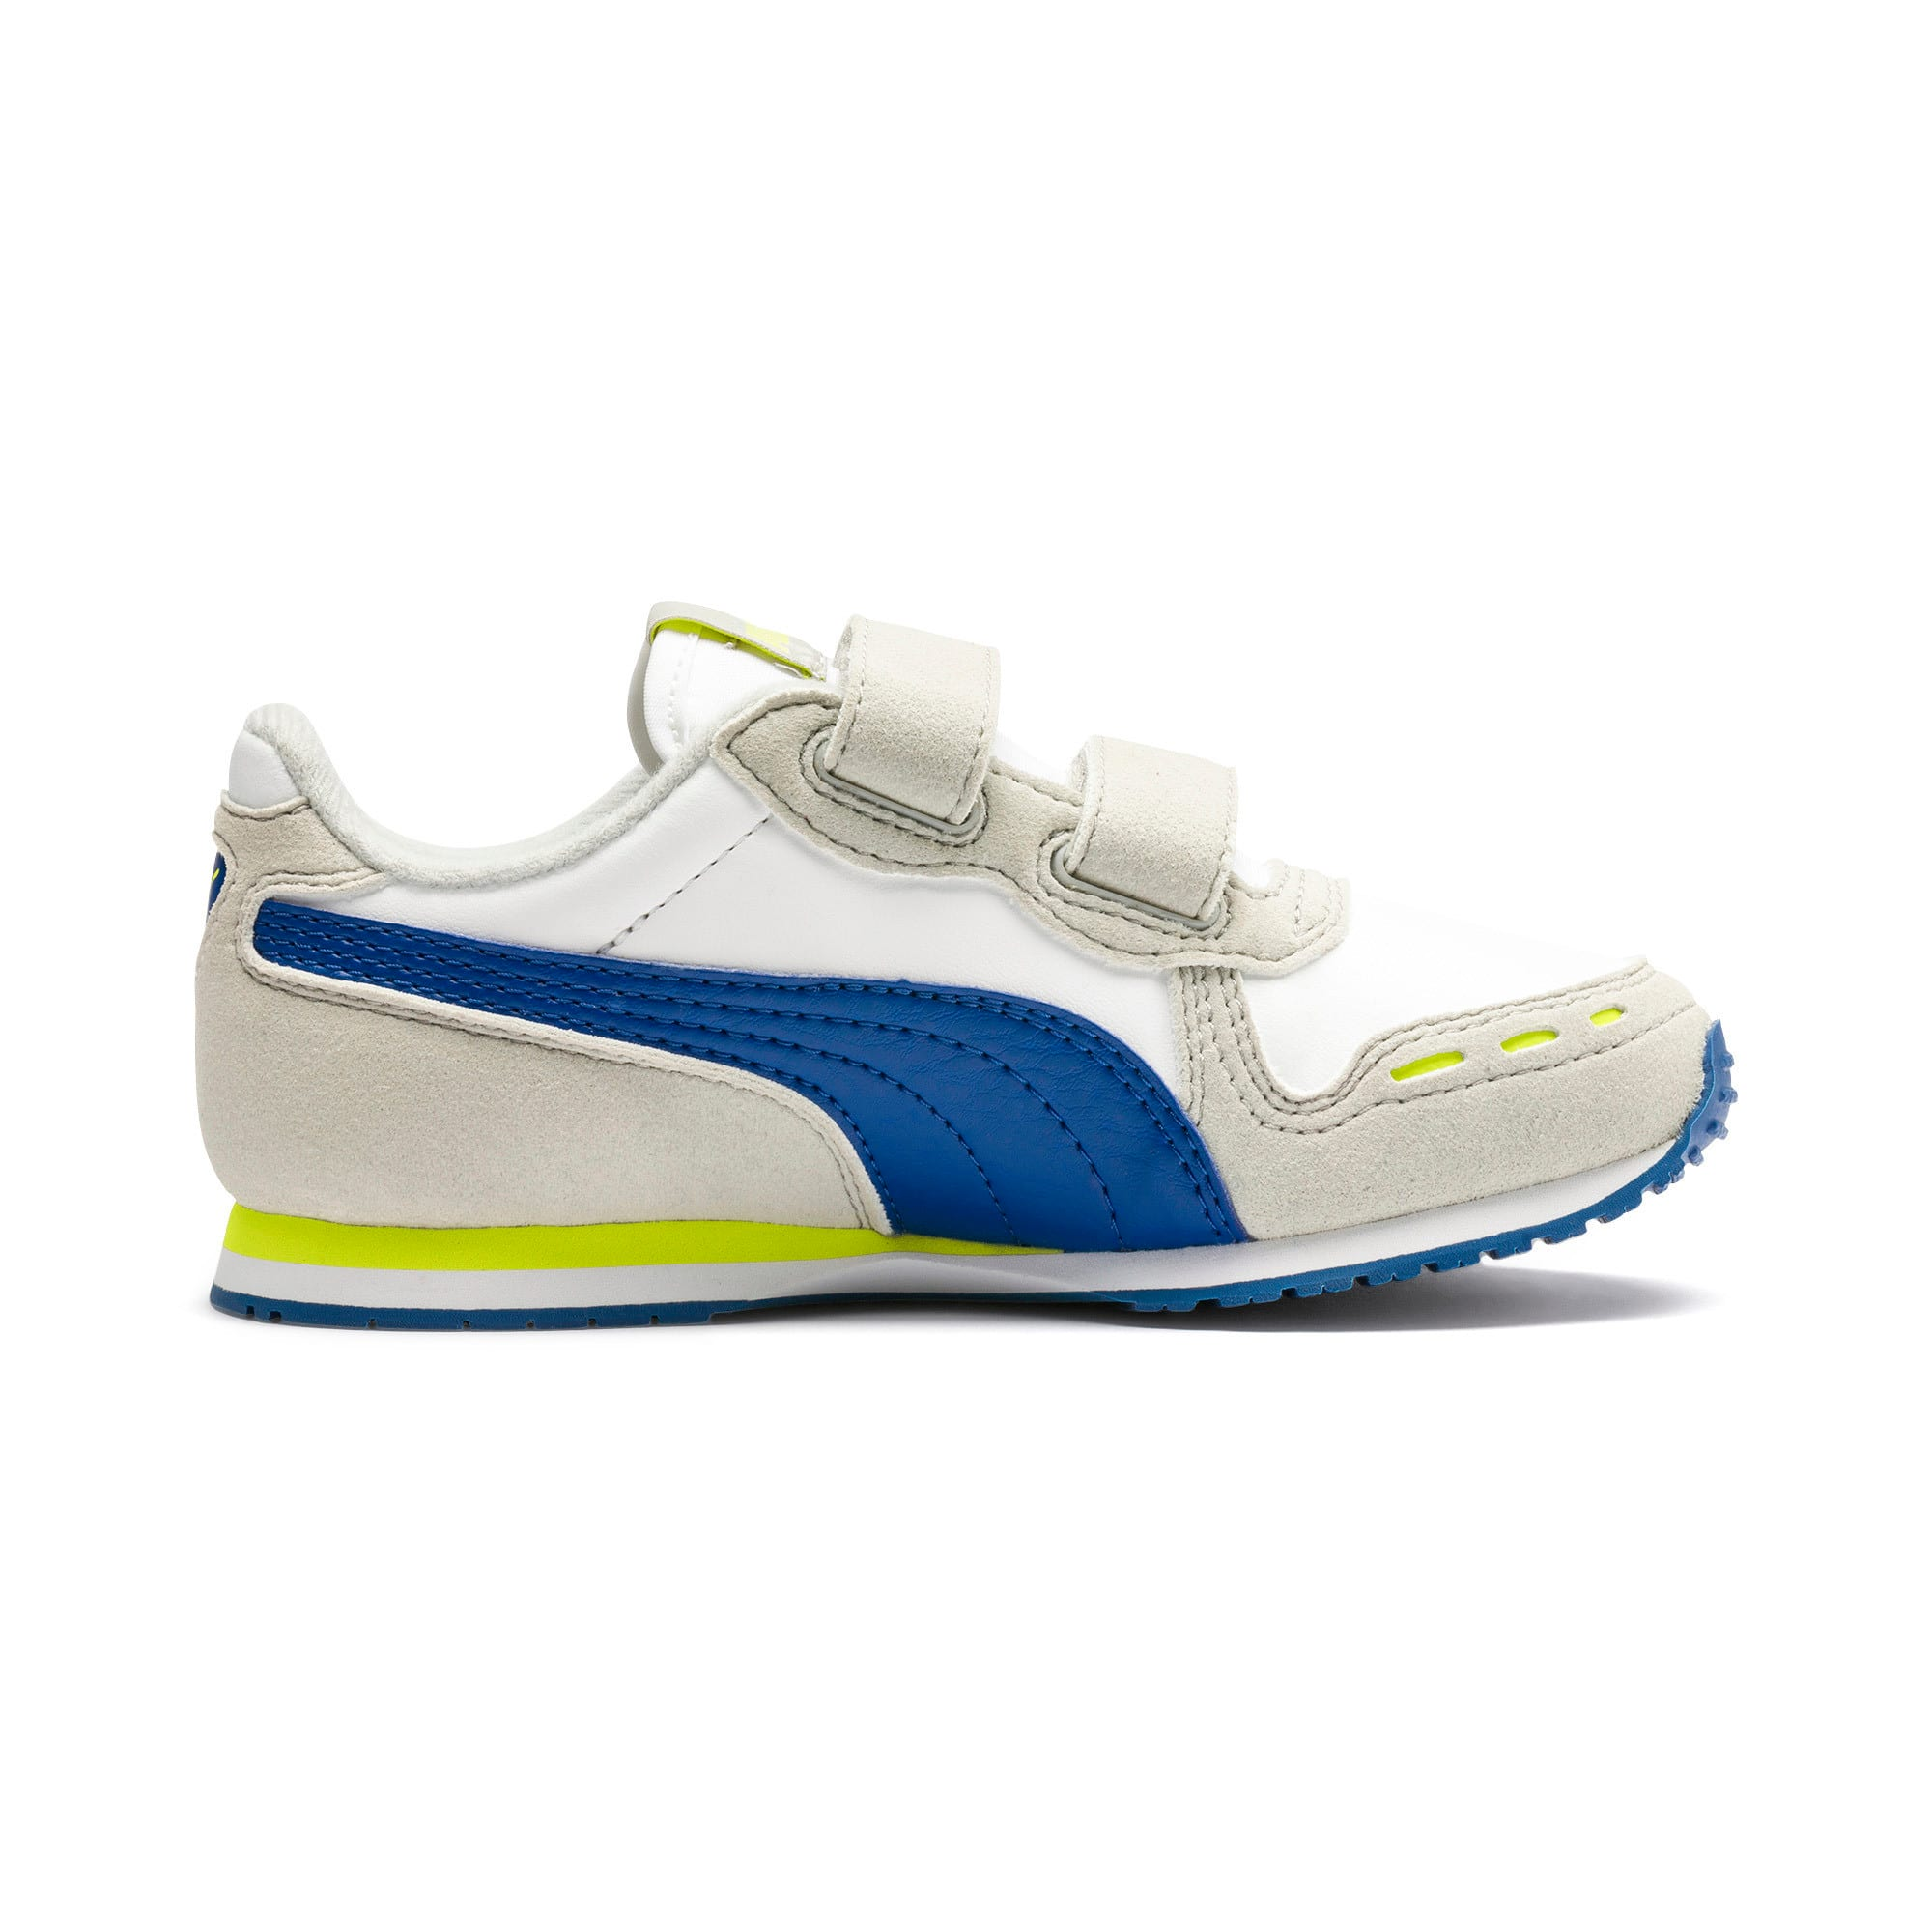 Thumbnail 5 of Cabana Racer SL V PS Baby Sneaker, Puma White-Galaxy Blue, medium